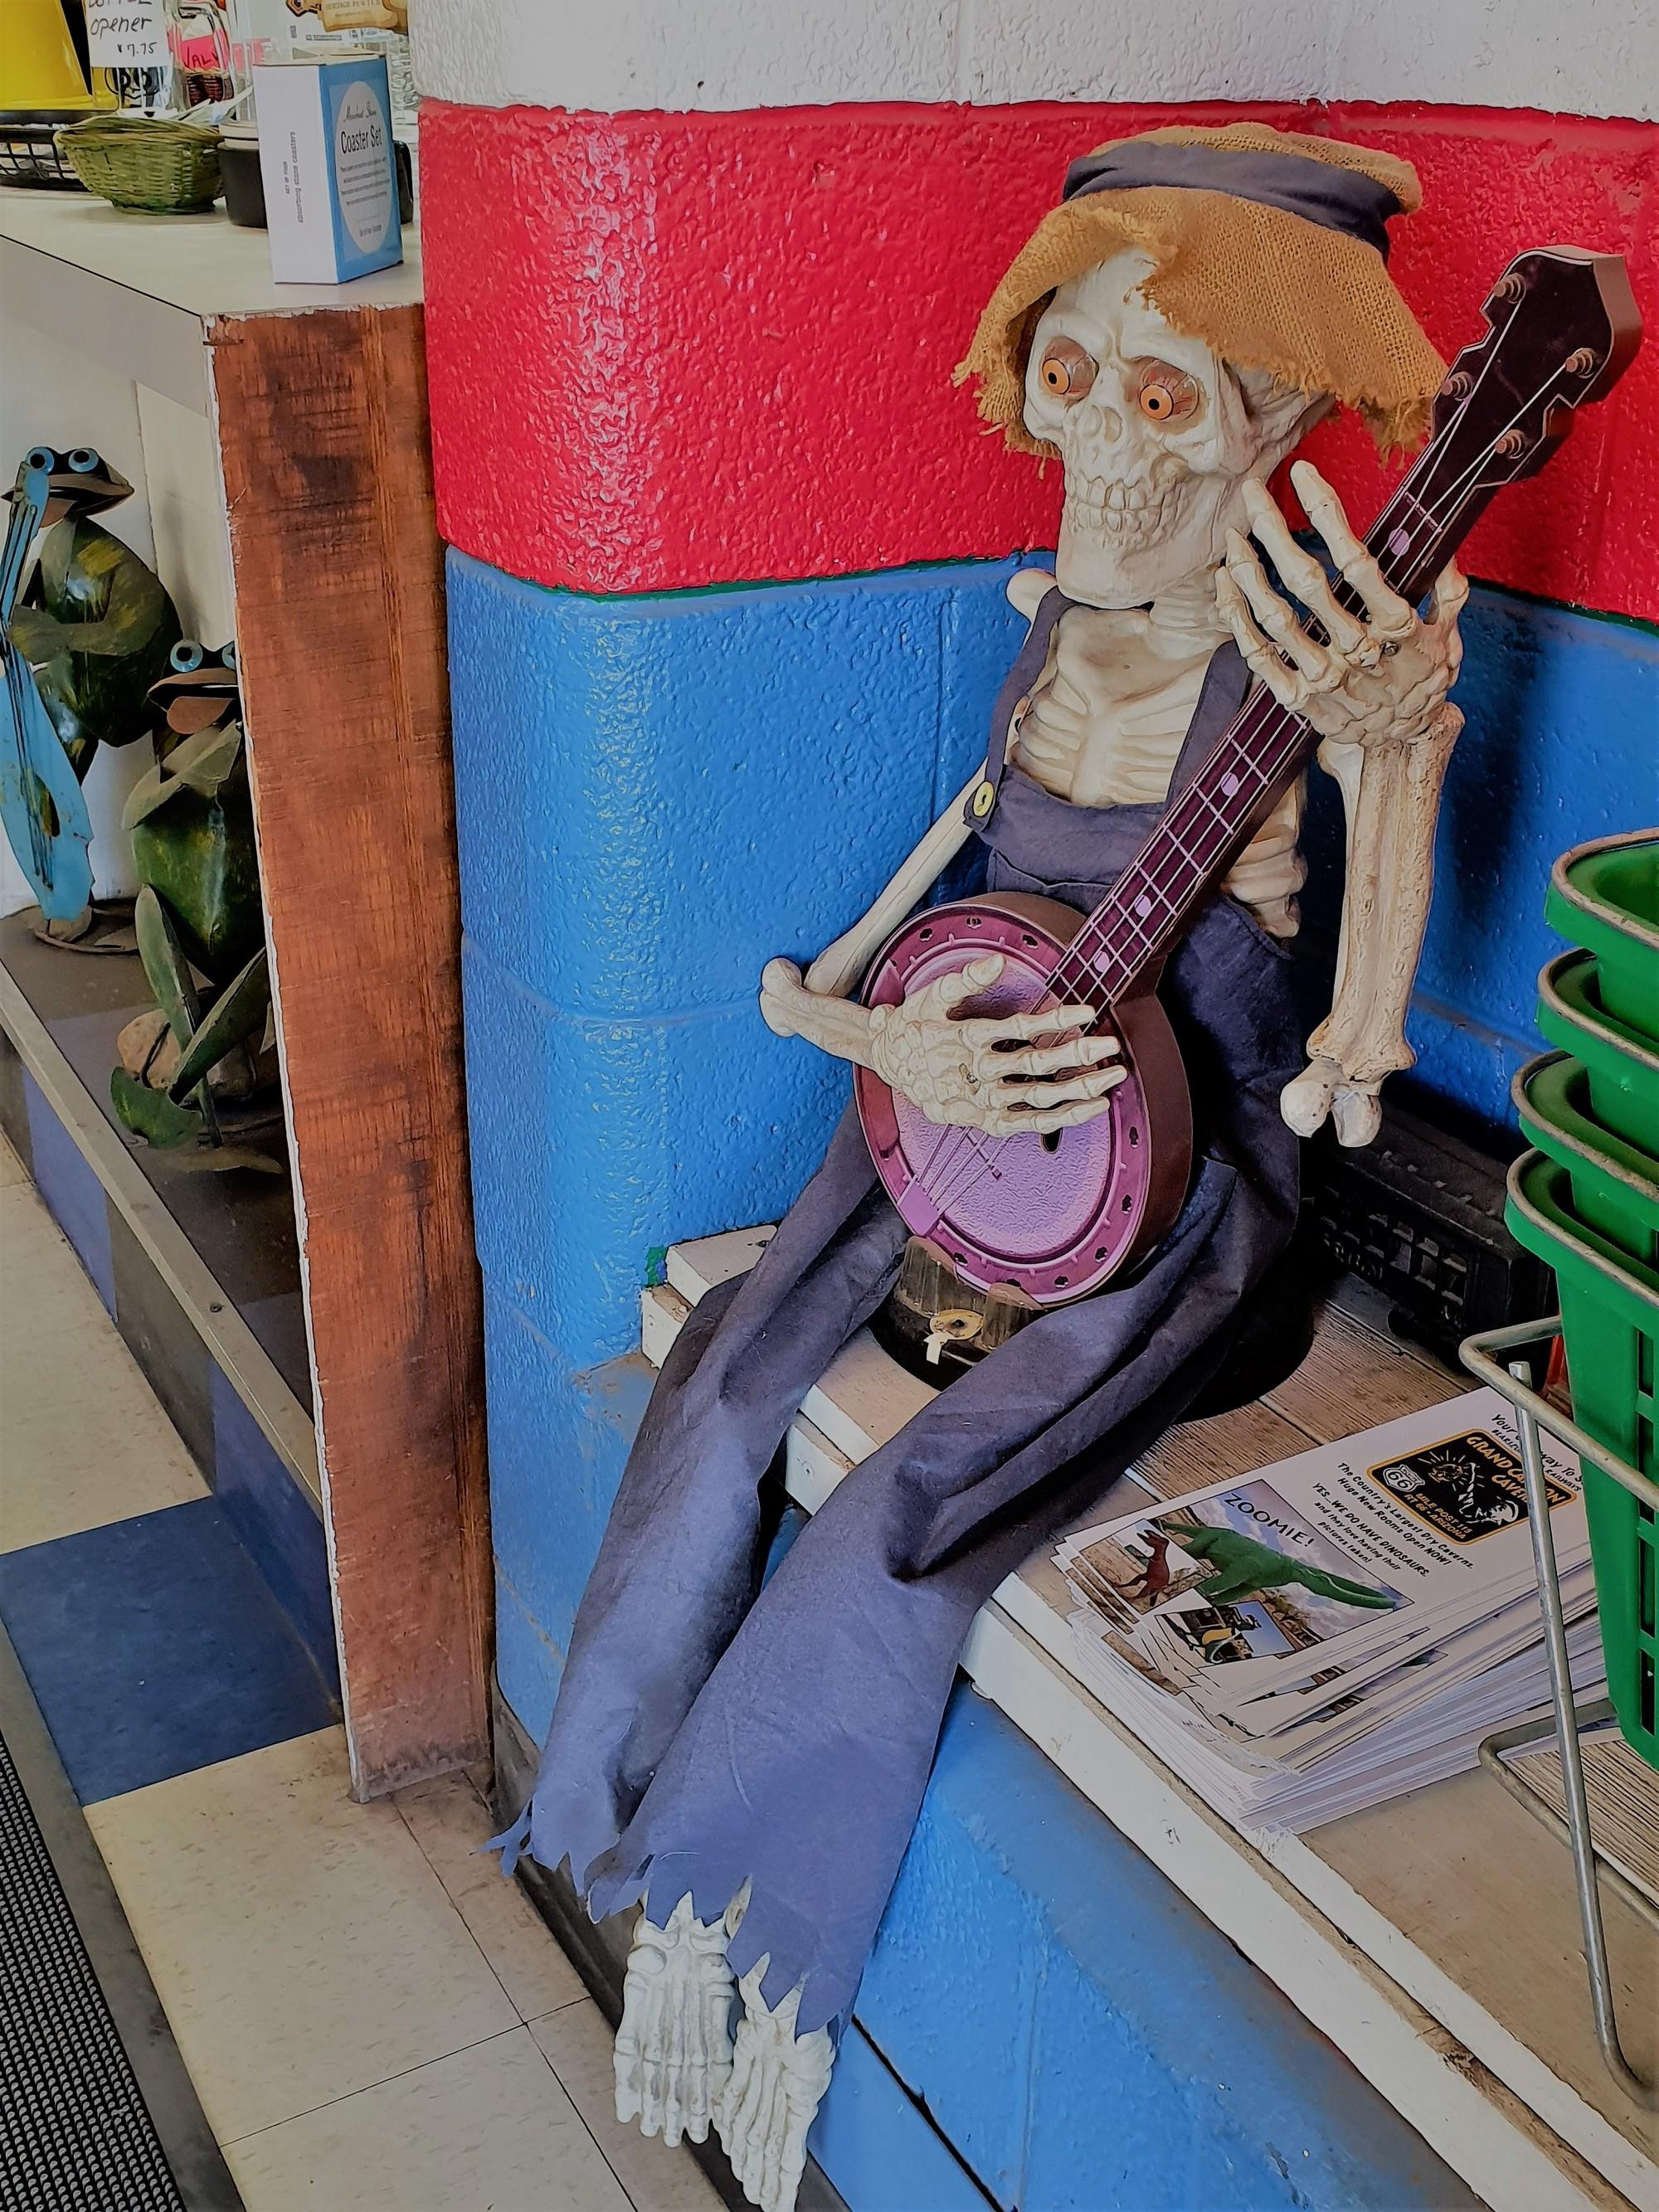 Vechiul chitarist - The Old Guitarist - kostantin.ro